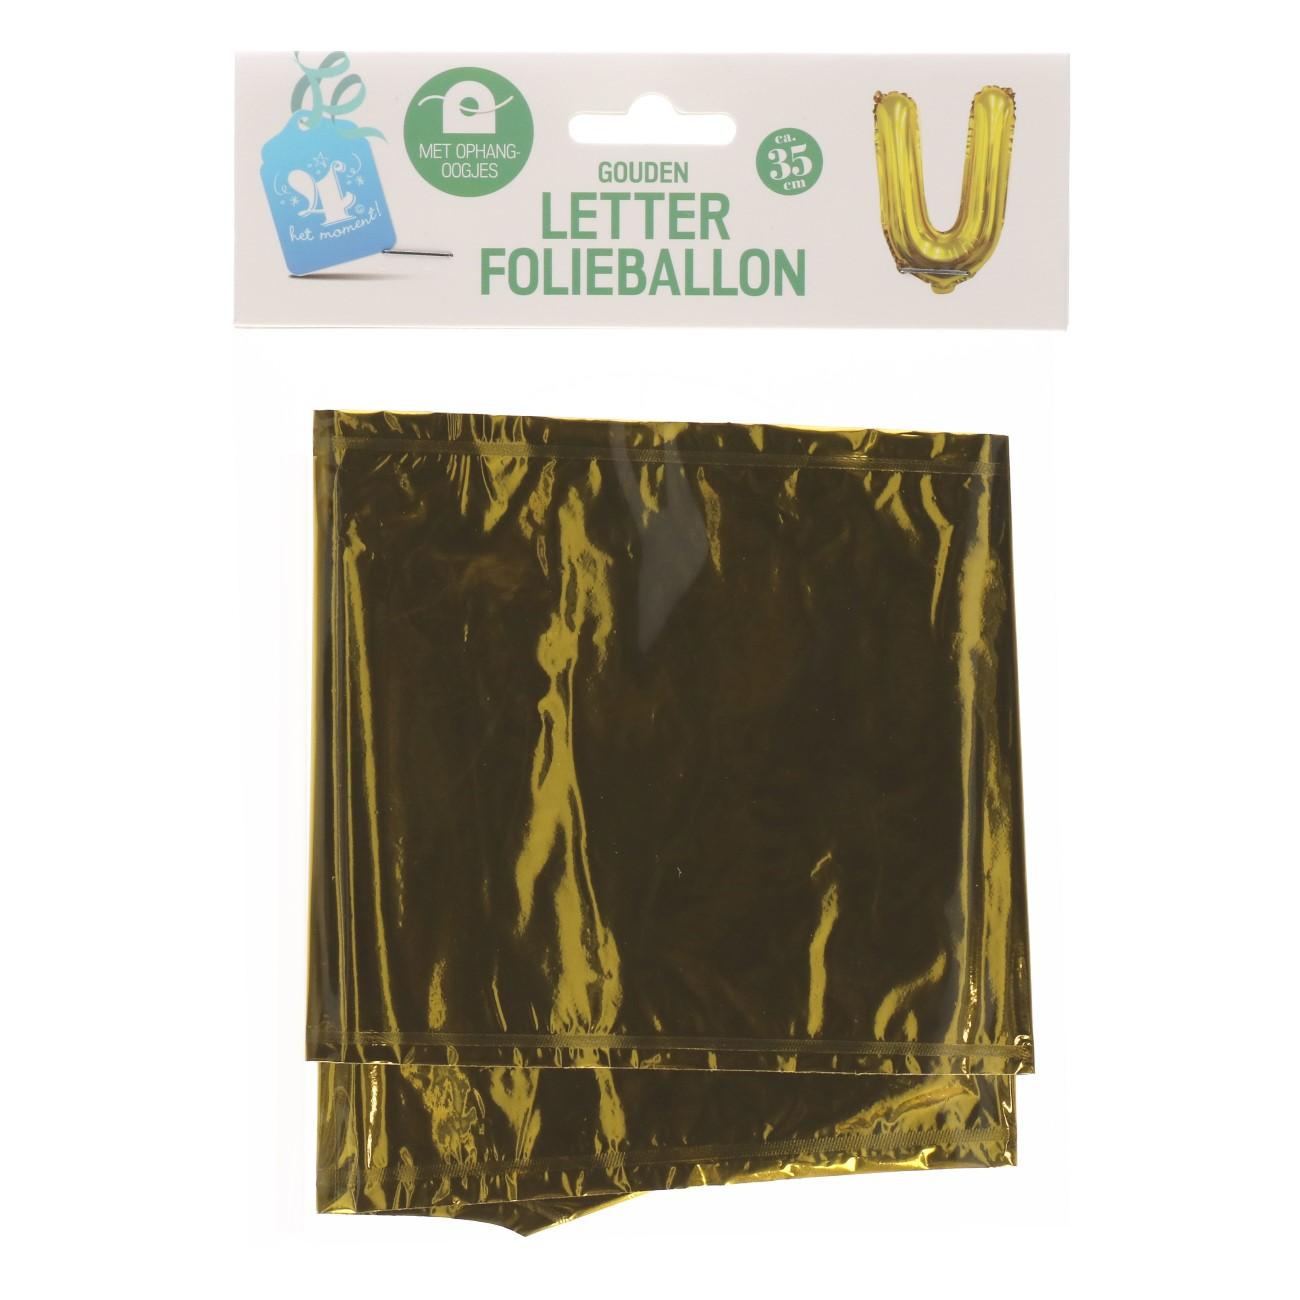 Folieballon letter goud U